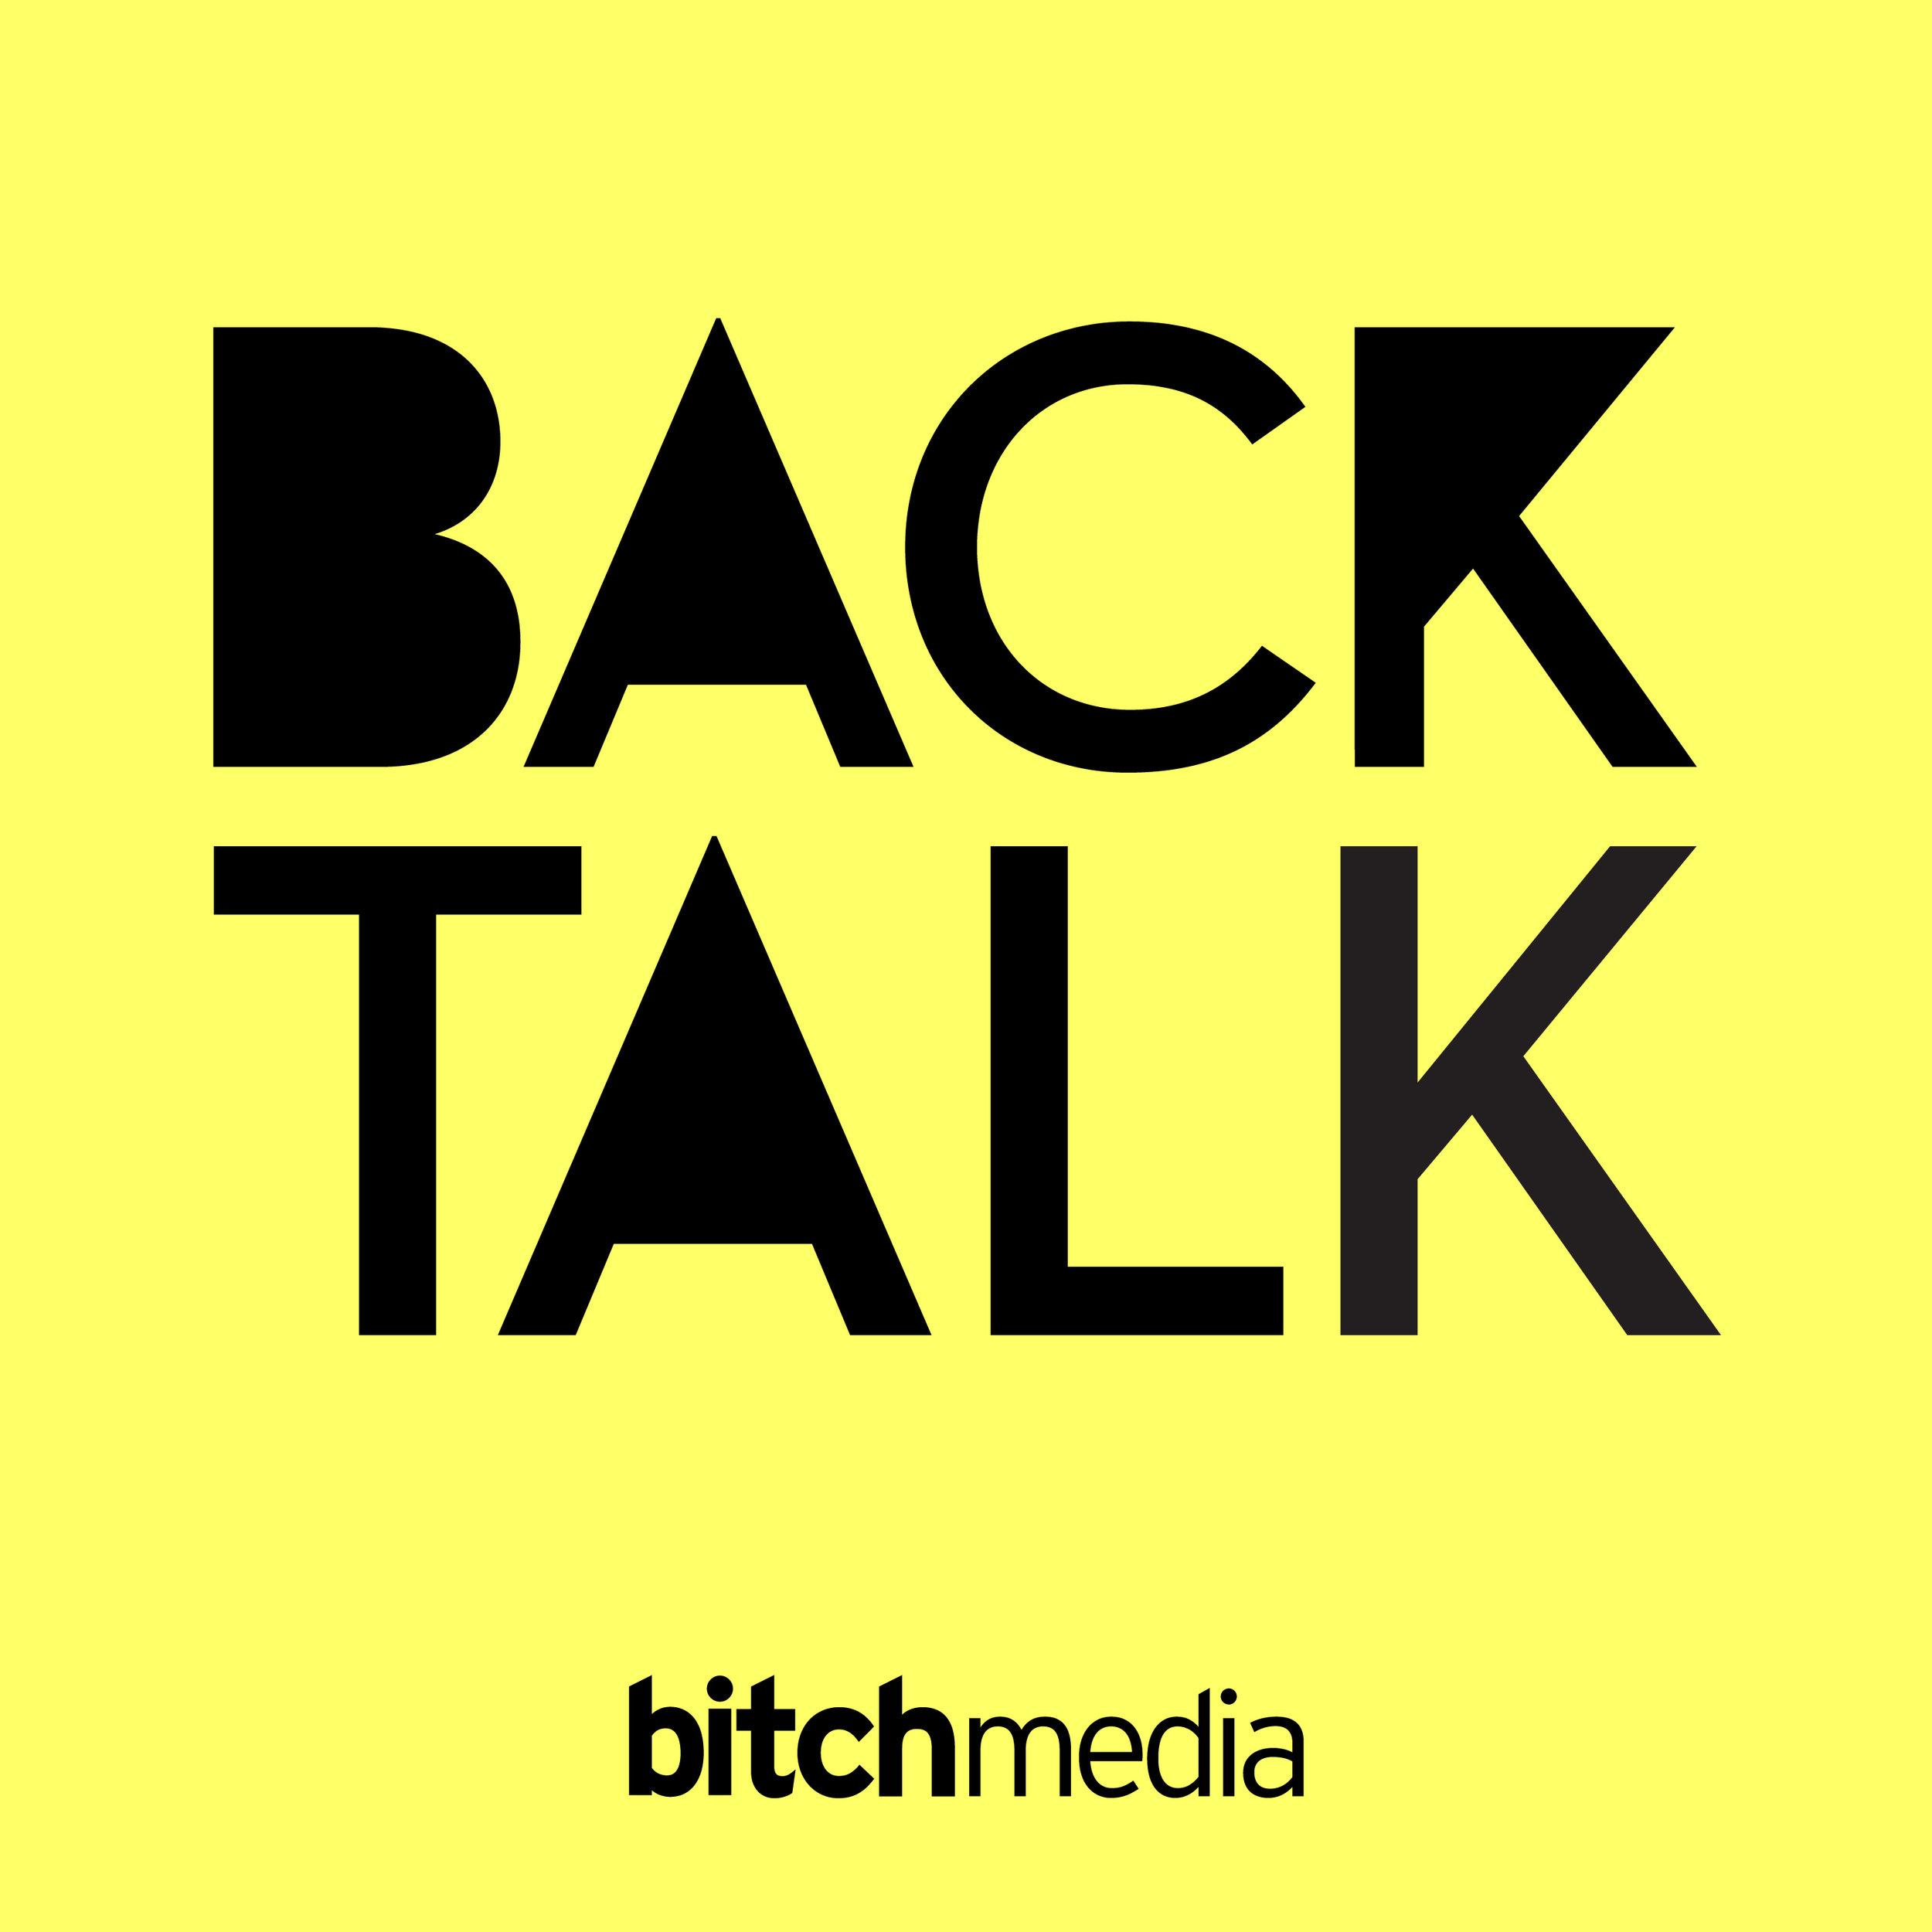 BitchMedia_BalkTalk_logo_3000x3000.jpg